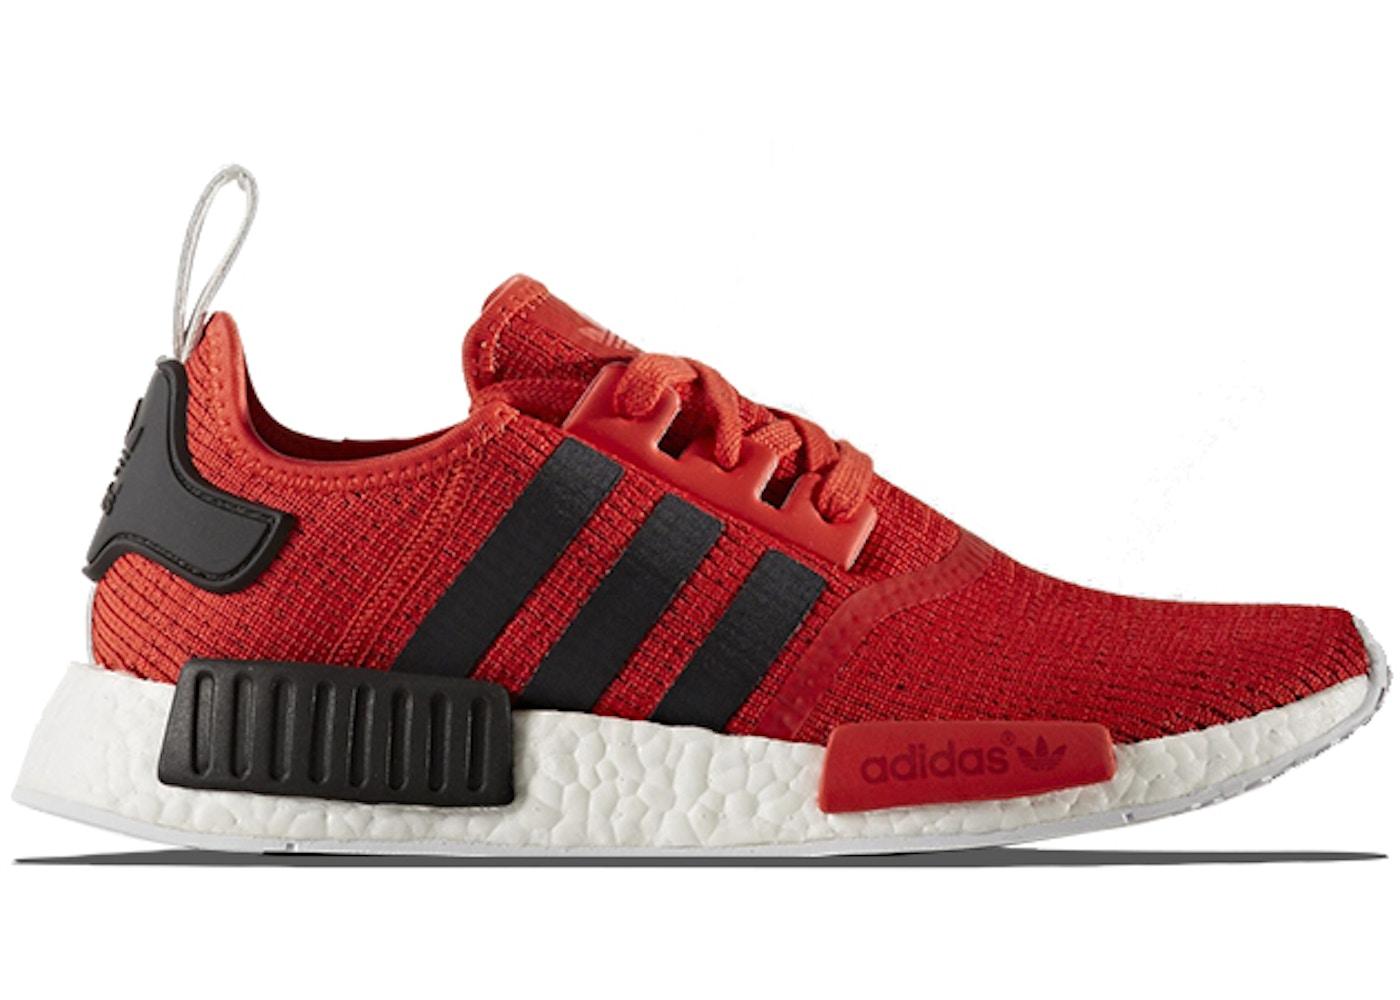 promo code 030c5 e40b2 adidas NMD R1 Red Black